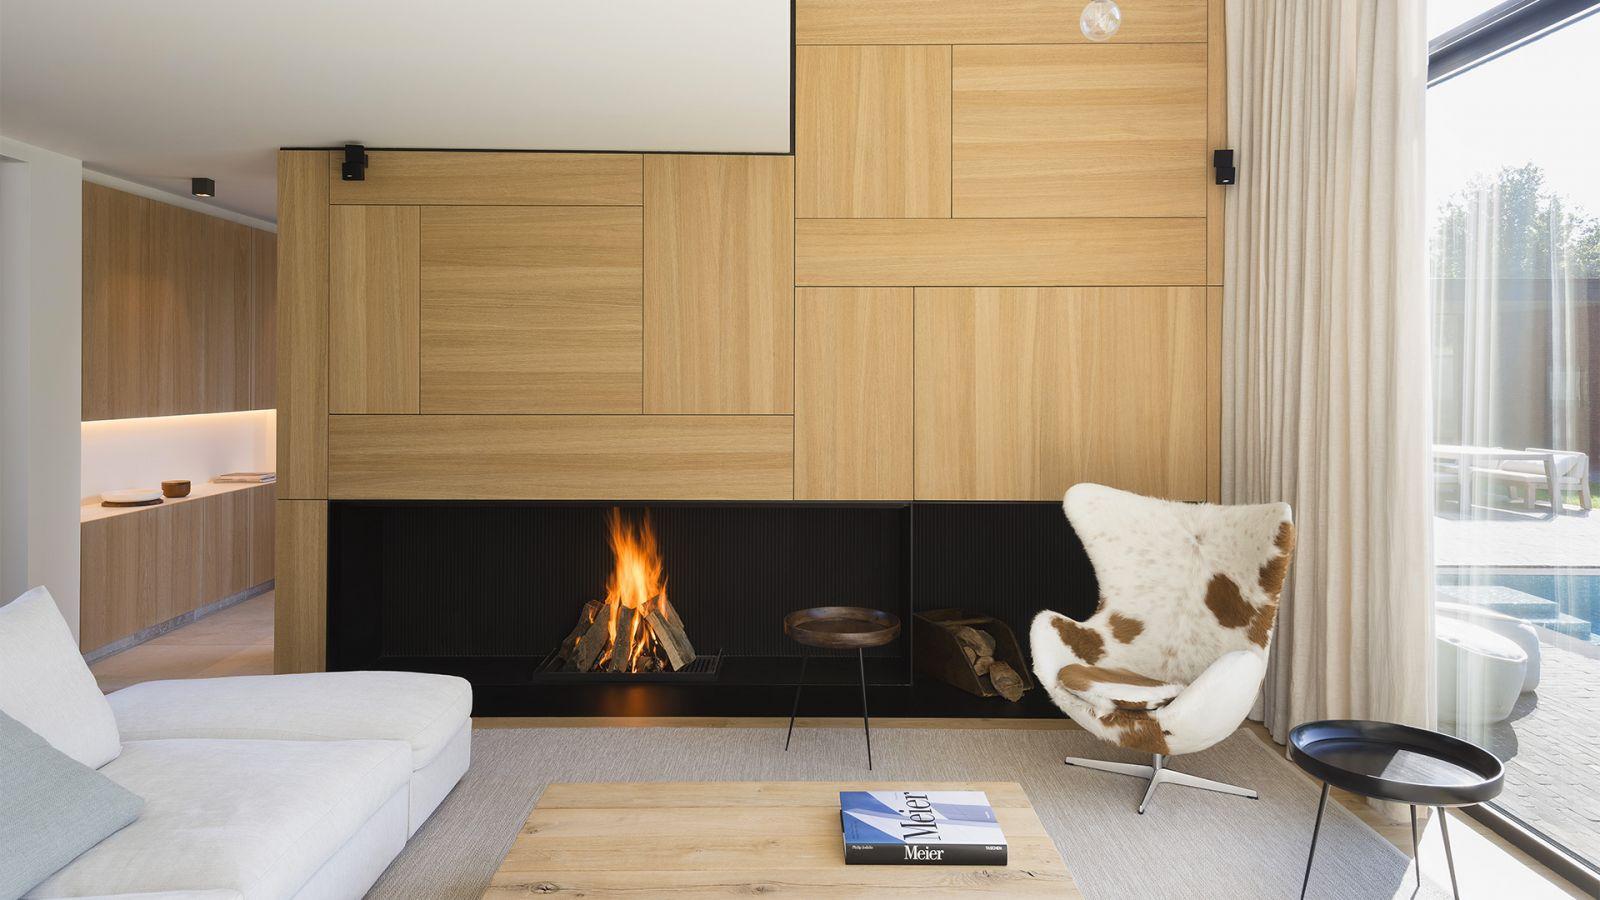 atry home chemin es et po les 06 vos coordonn es. Black Bedroom Furniture Sets. Home Design Ideas